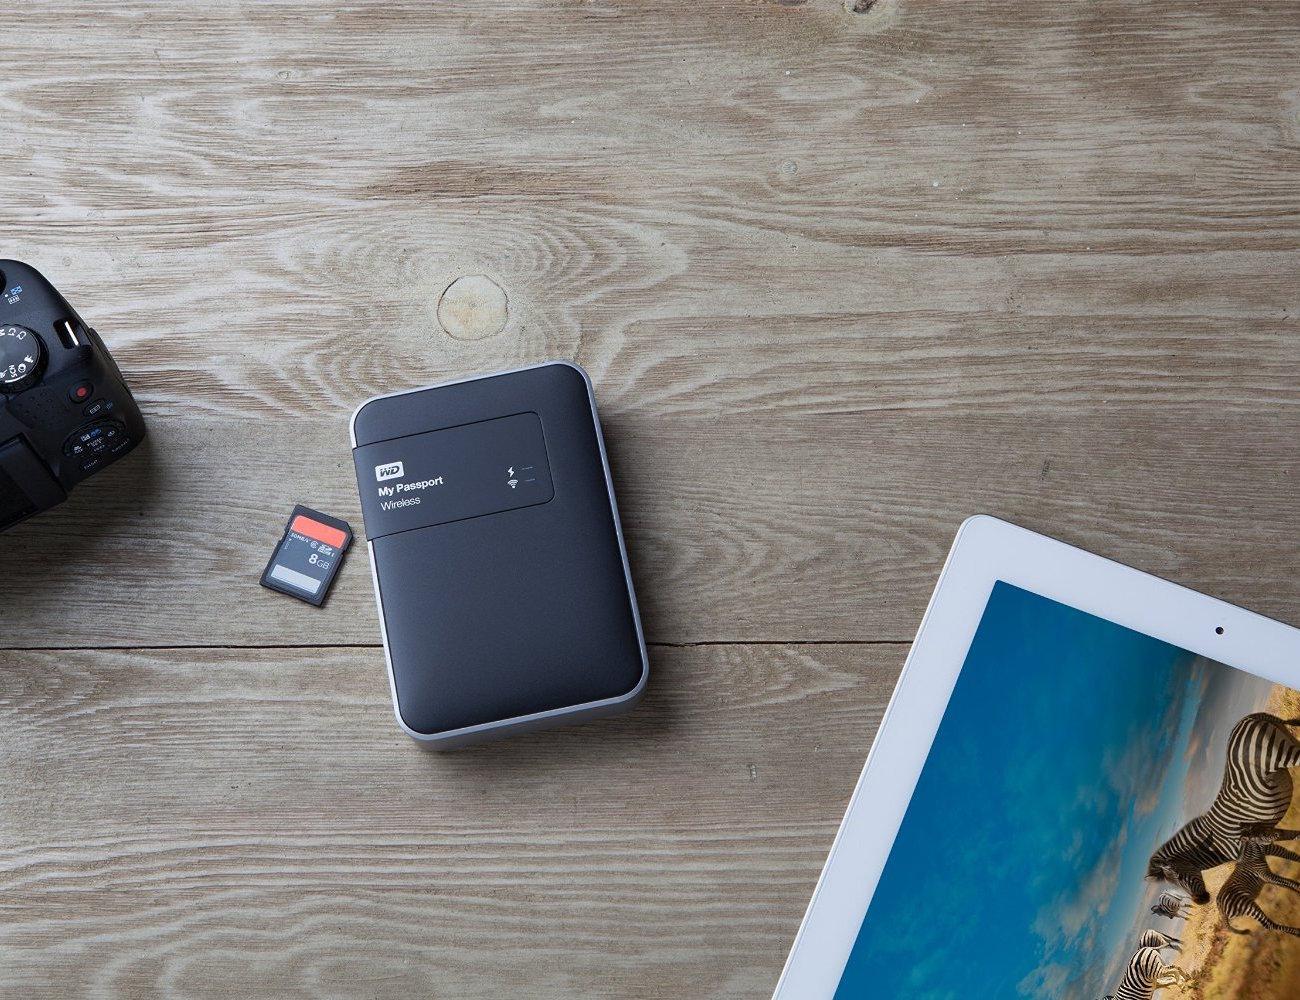 WD+My+Passport+2TB+Wireless+Hard+Drive